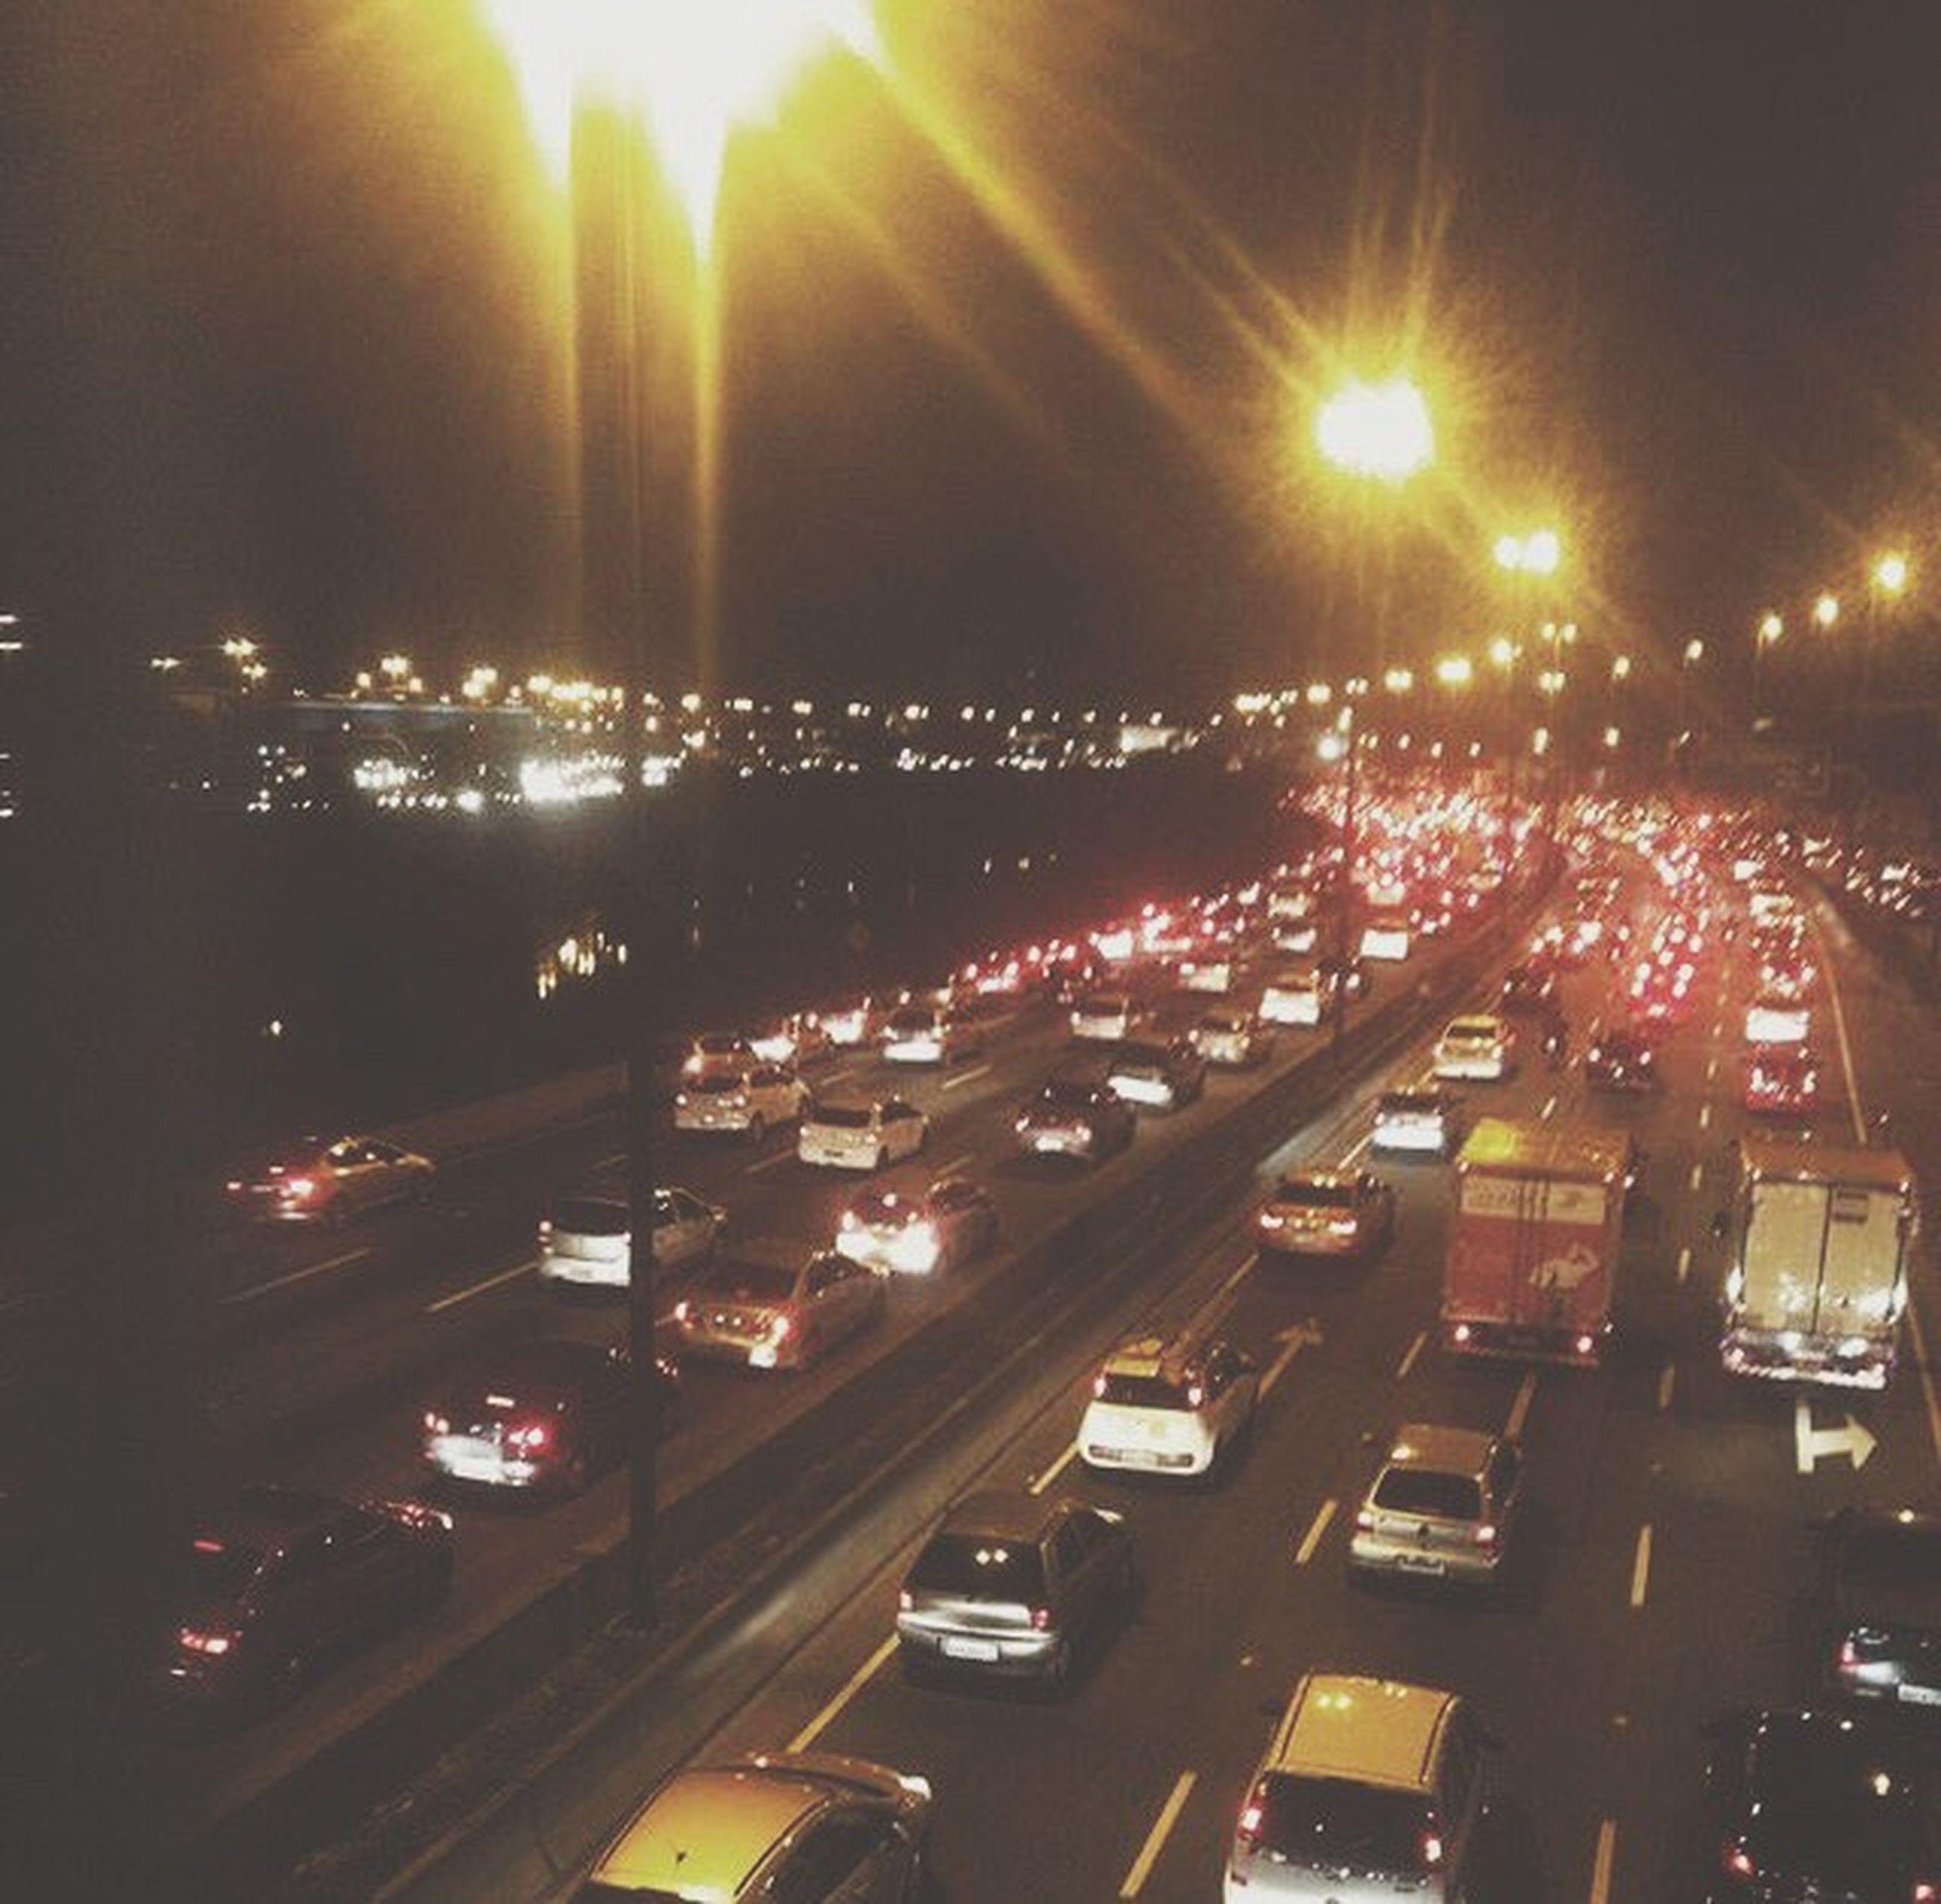 transportation, illuminated, night, traffic, city, car, road, no people, outdoors, sky